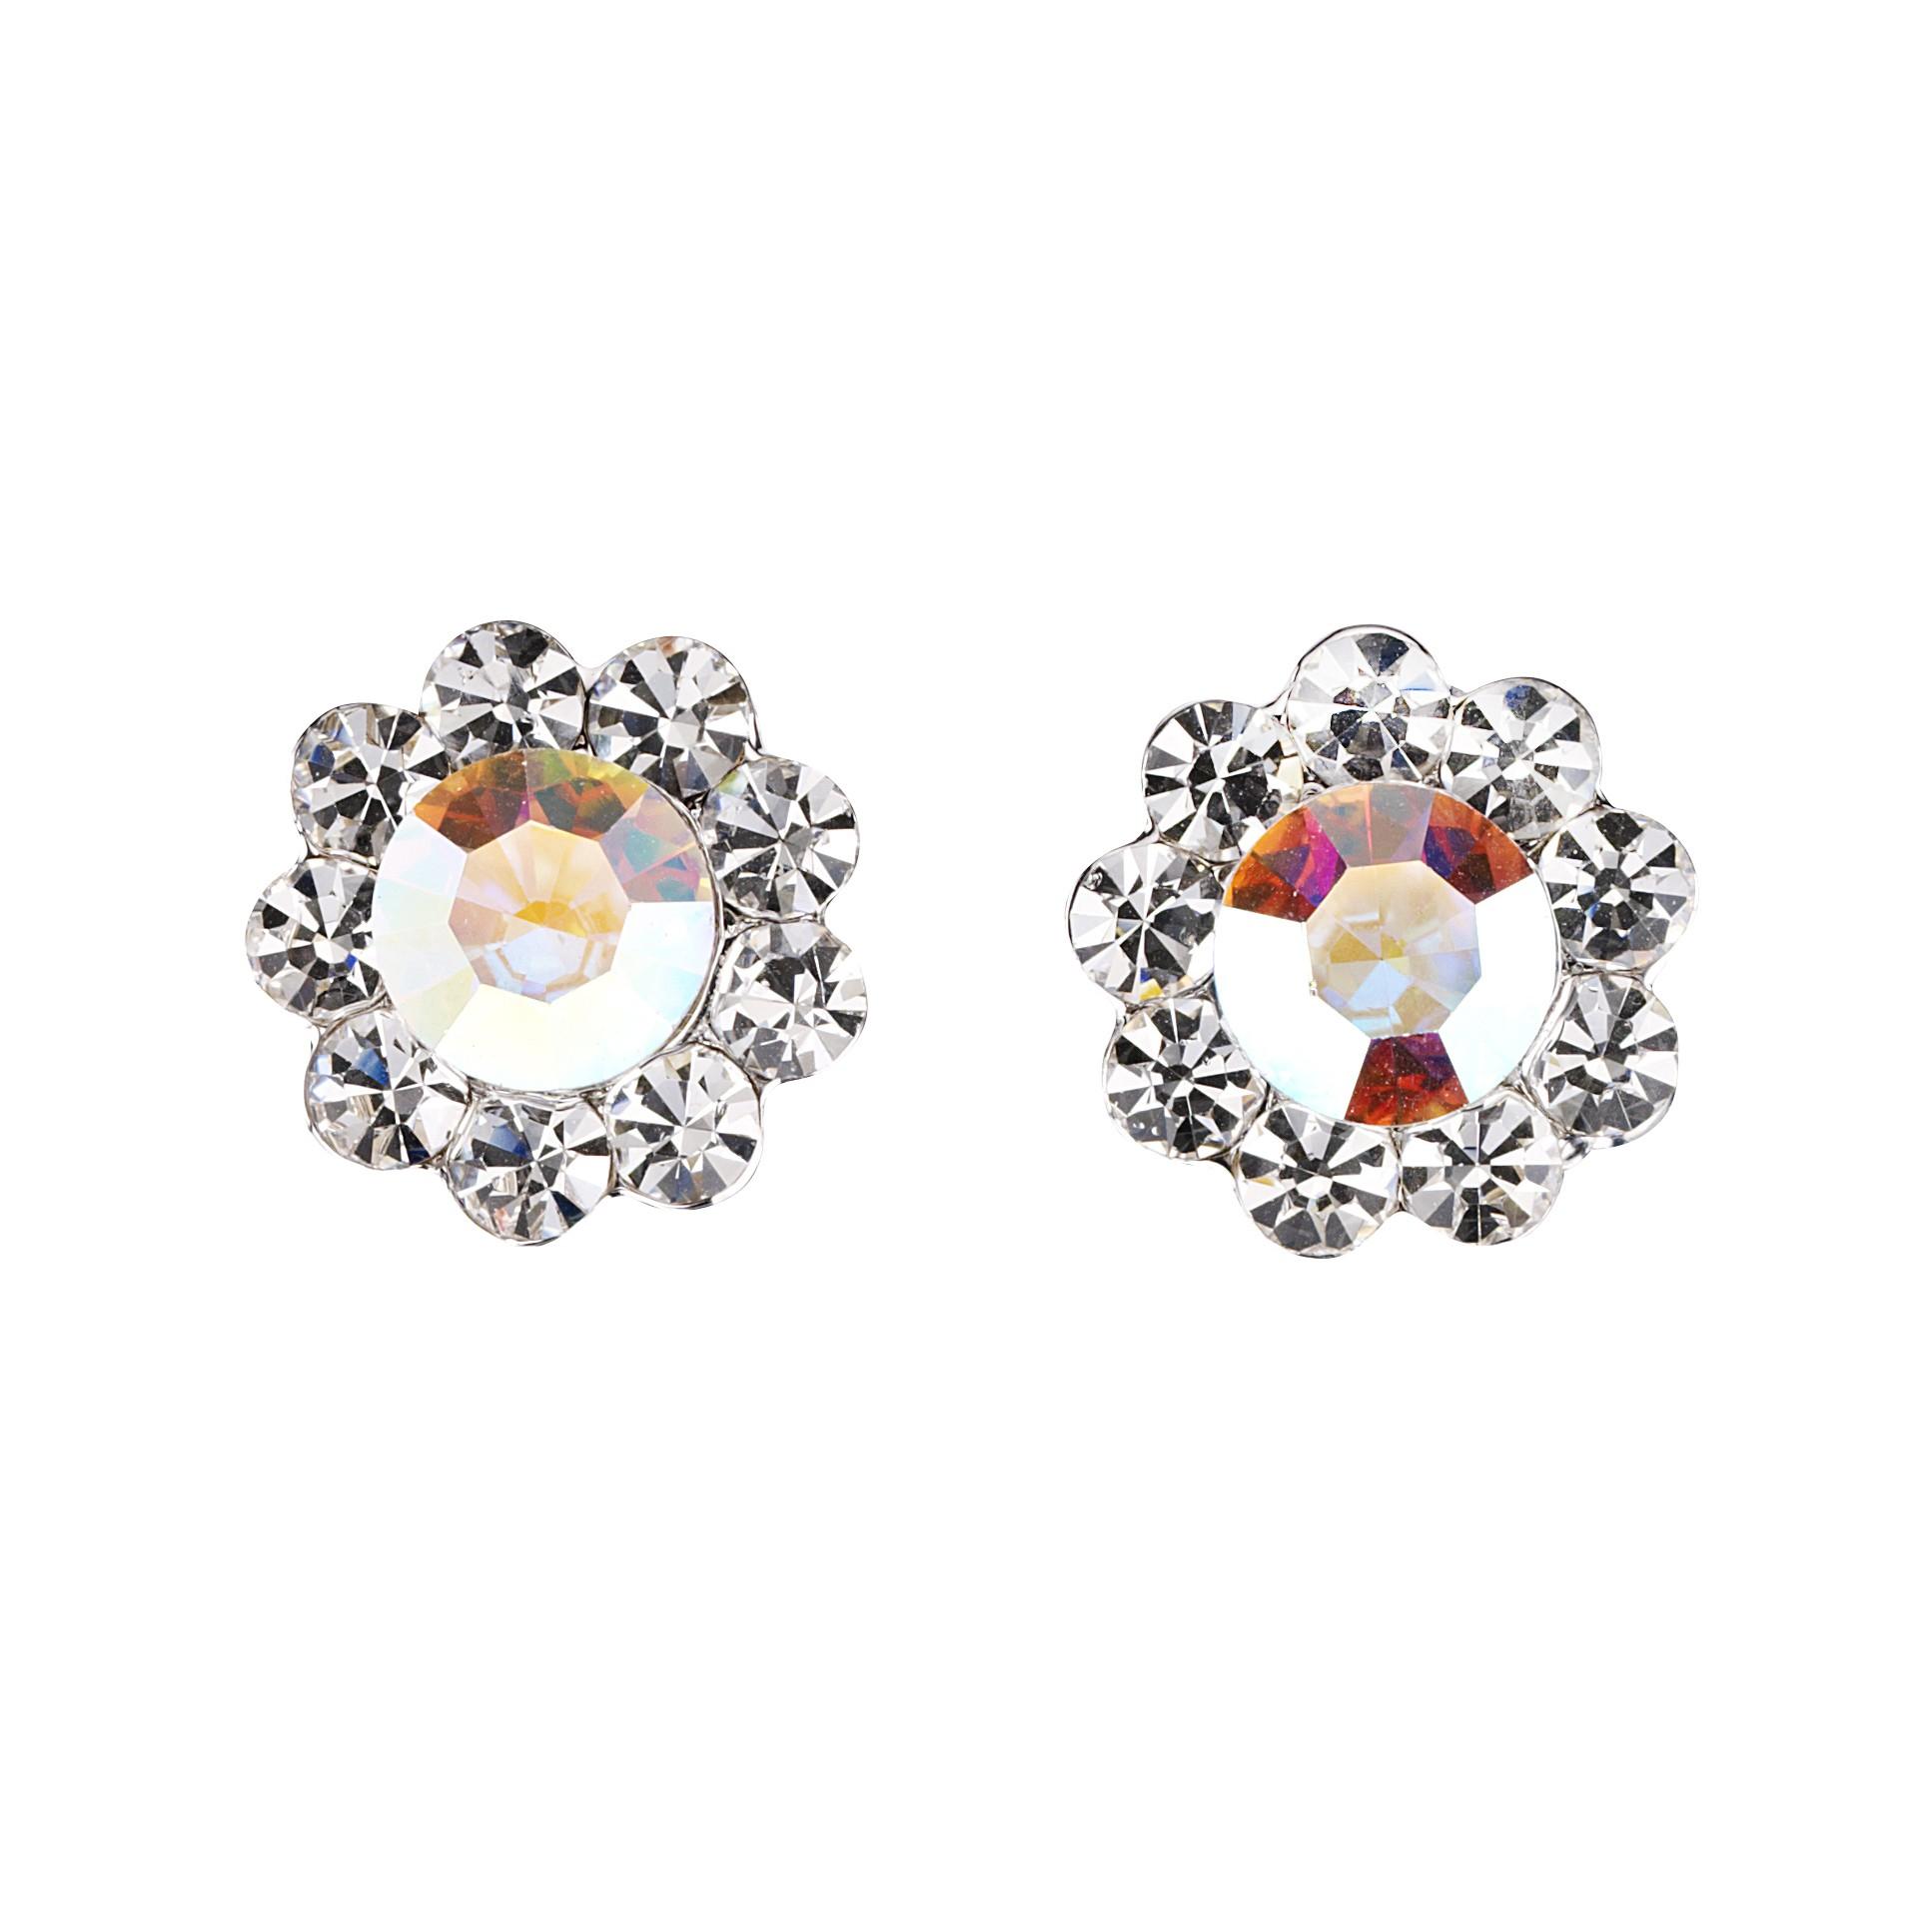 Swarovski Crystal Gemini London Uk Jewellerys White